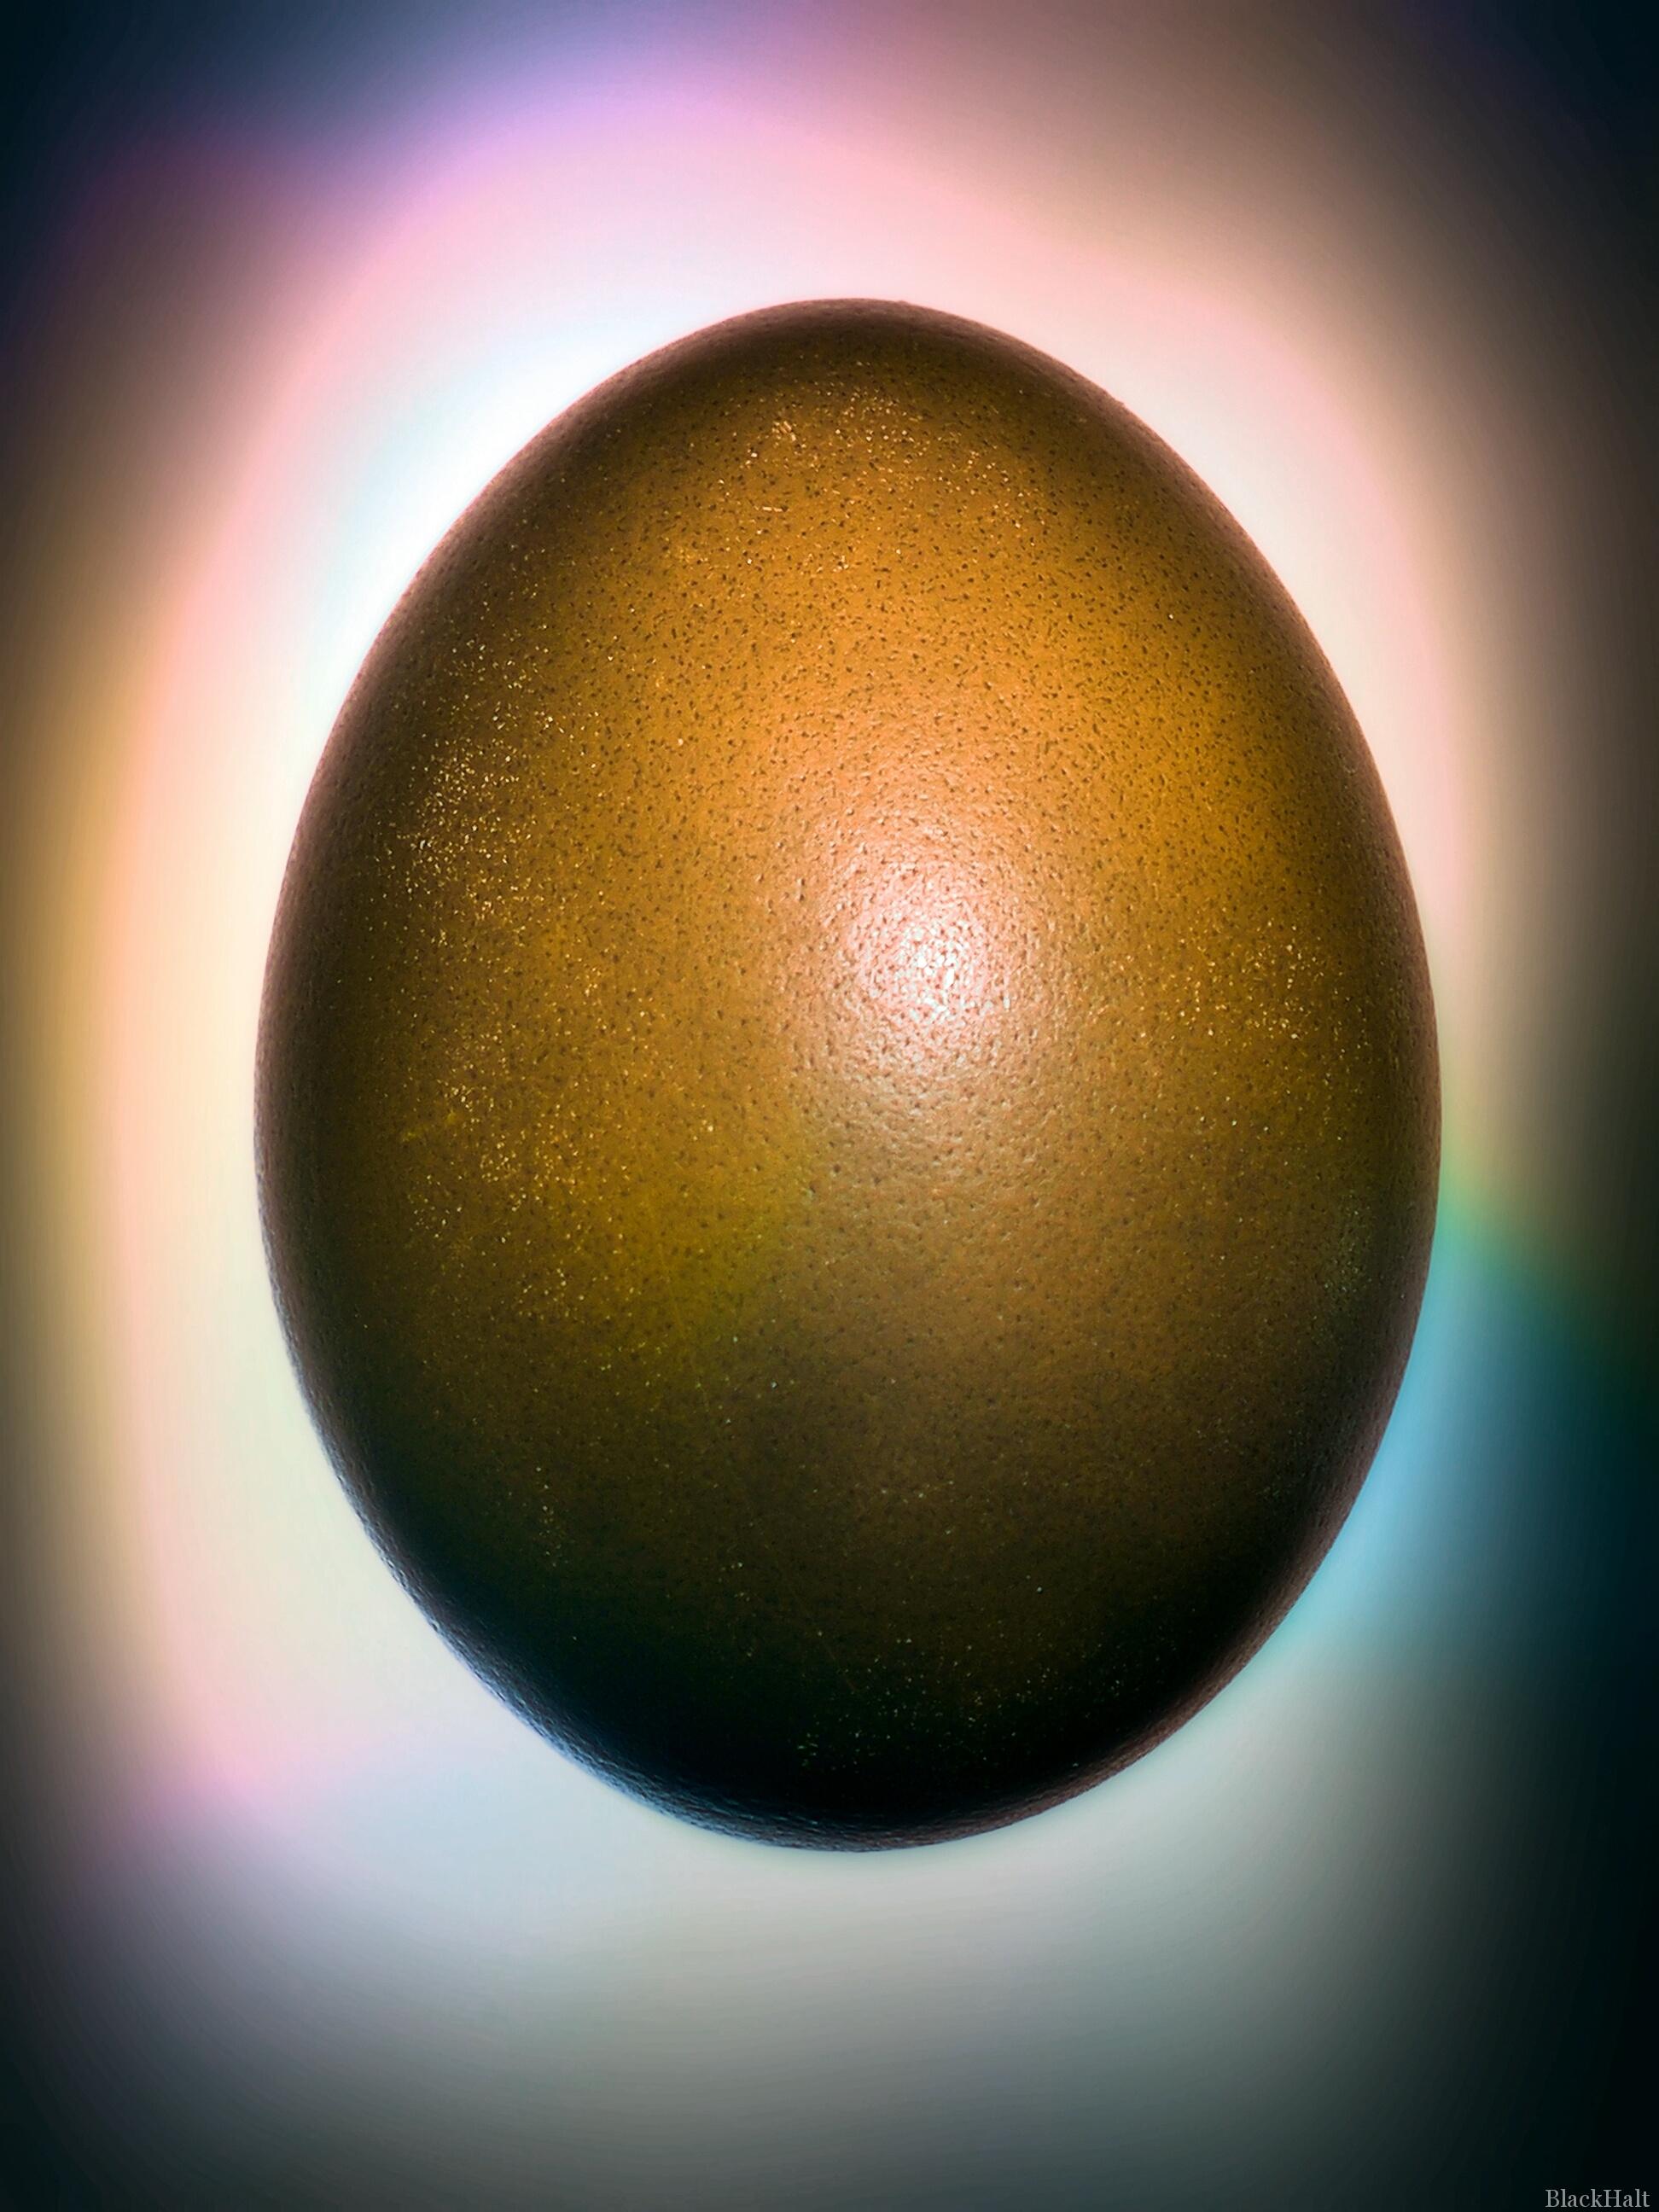 Lieldienu olas Nr.105